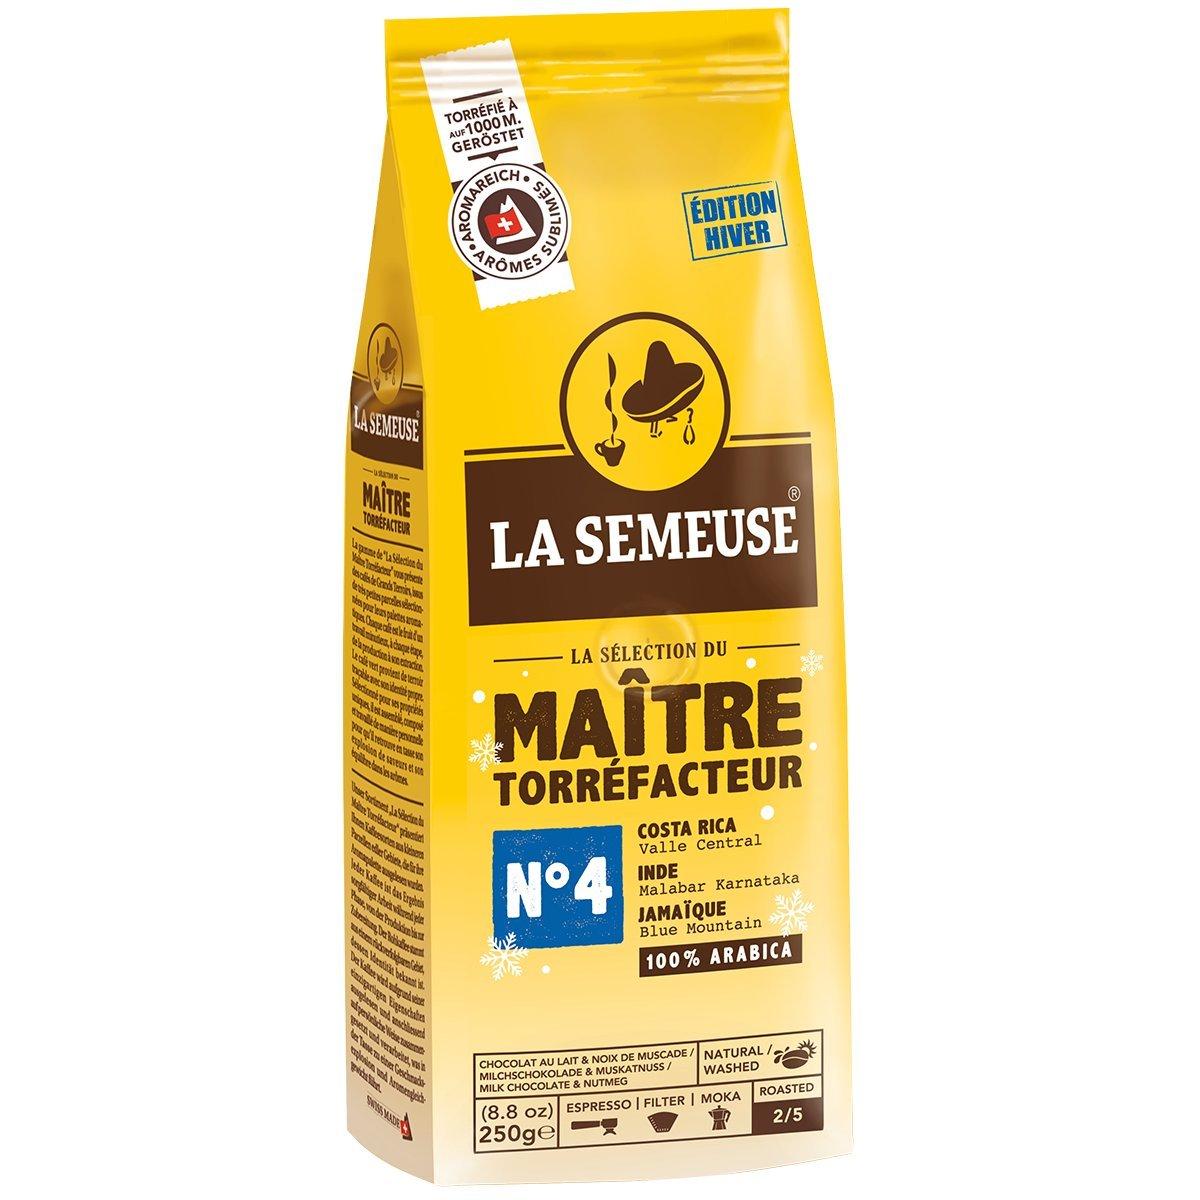 SMT N°4 Swiss High Altitude Premium Coffee Beans, 100% Arabica Coffee, Best before date:  28.12.2019